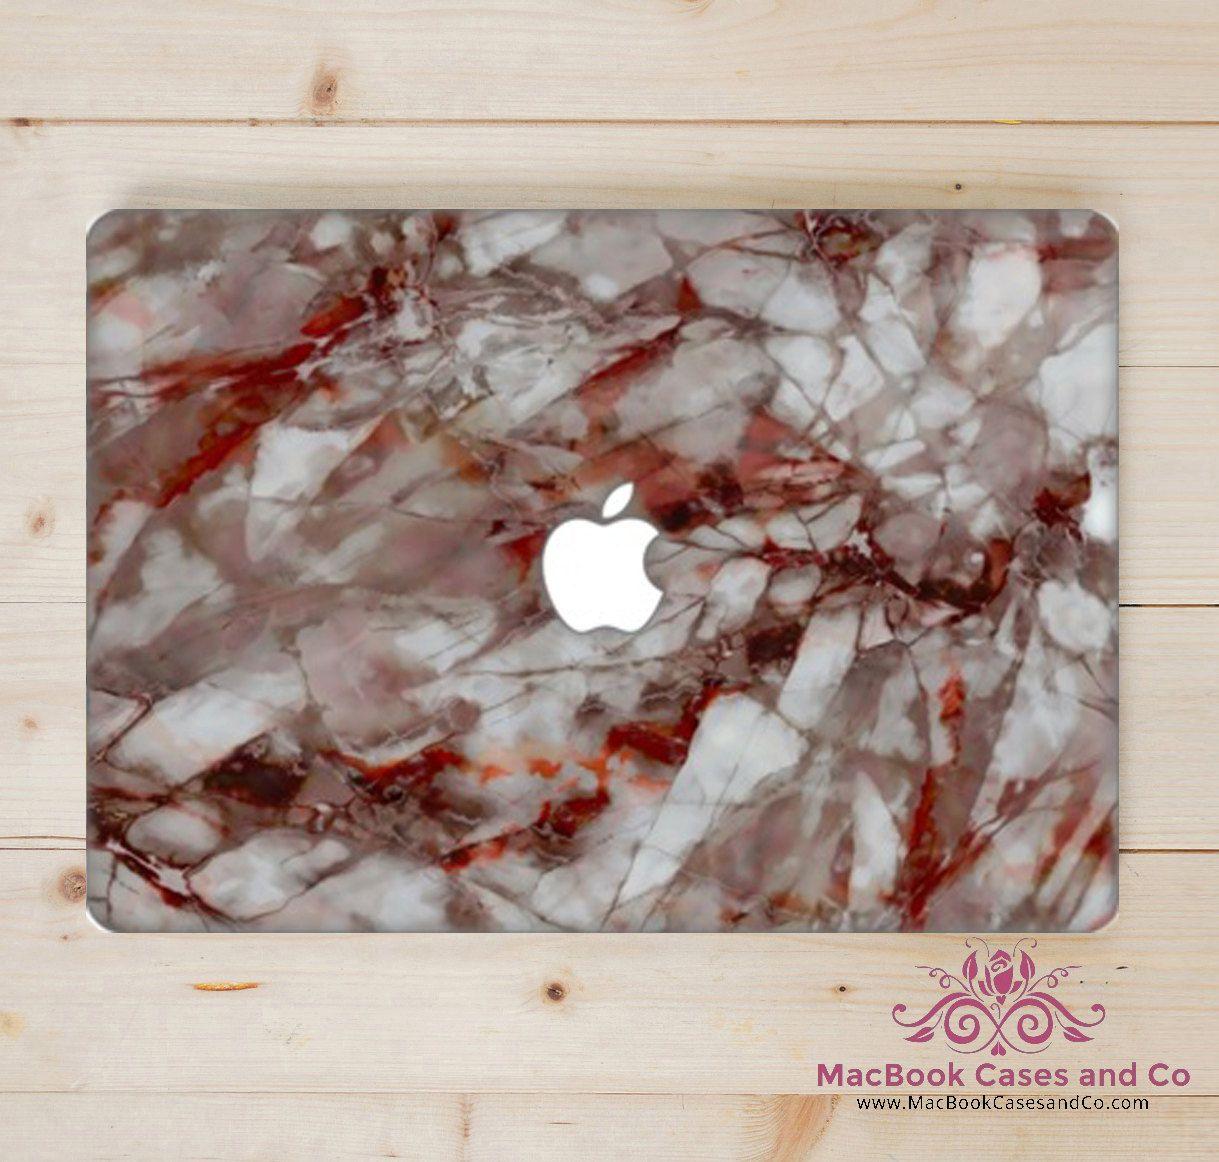 online retailer c0997 59867 Macbook Case. Marble Macbook case. Macbook Case. Red and white ...